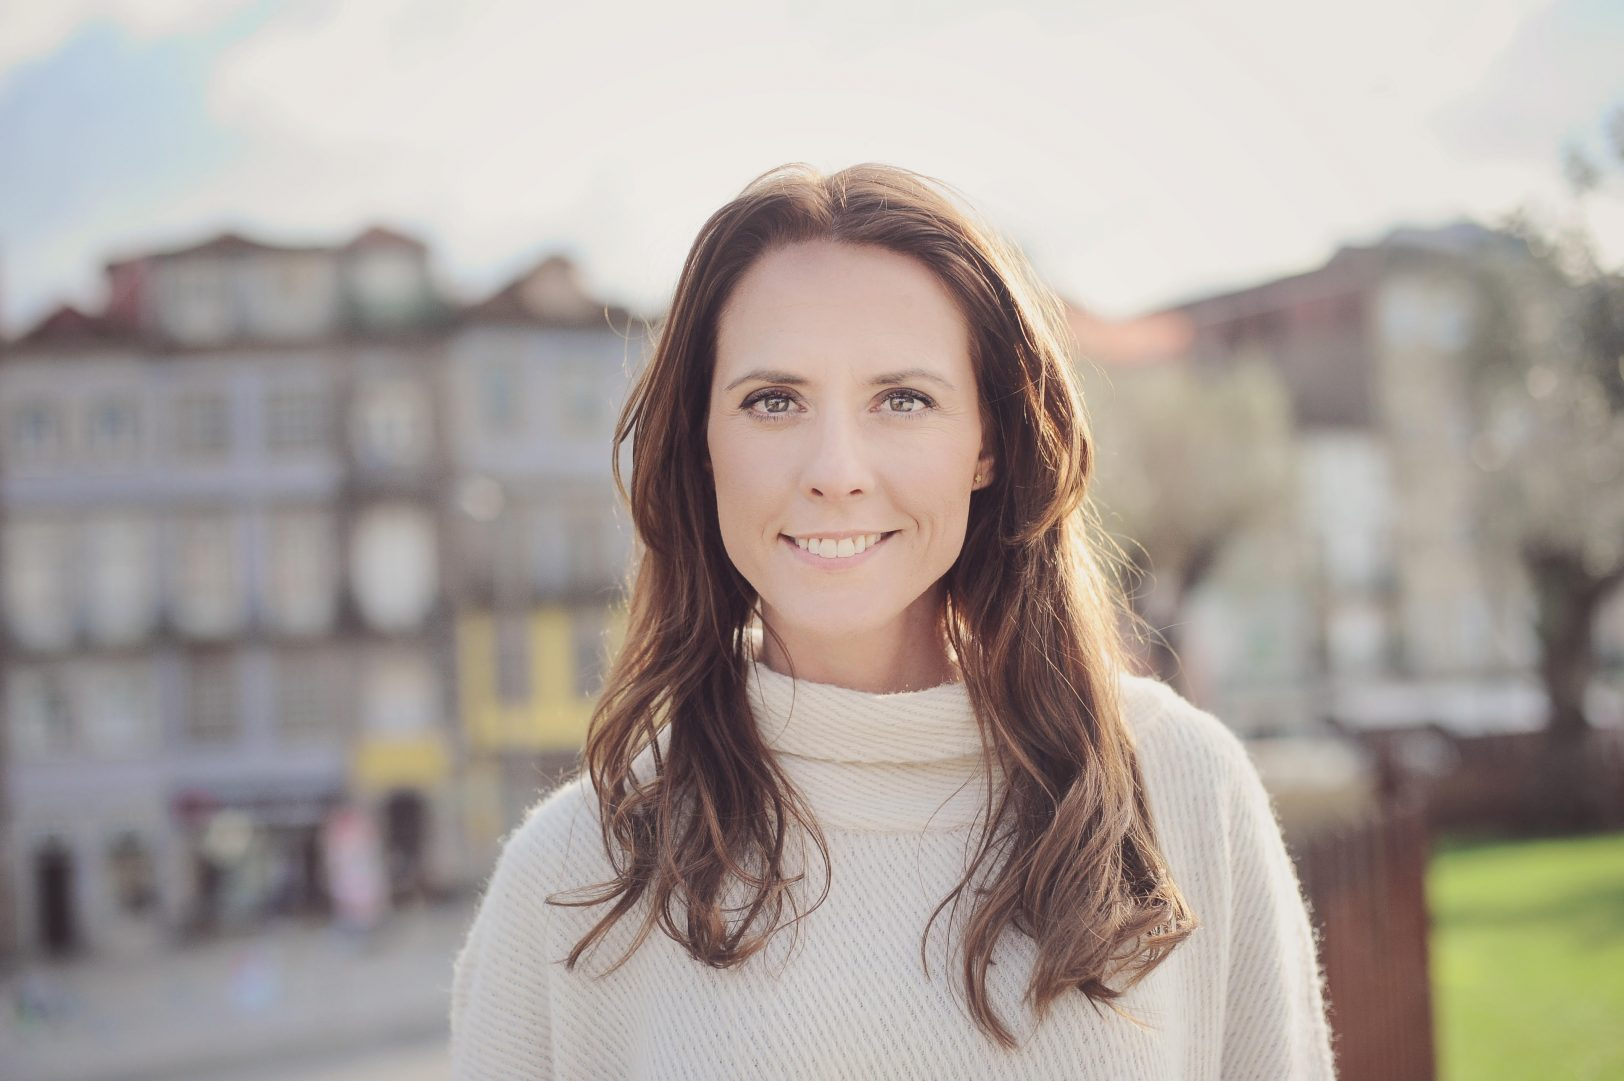 Entrevista com Mikaela Övén